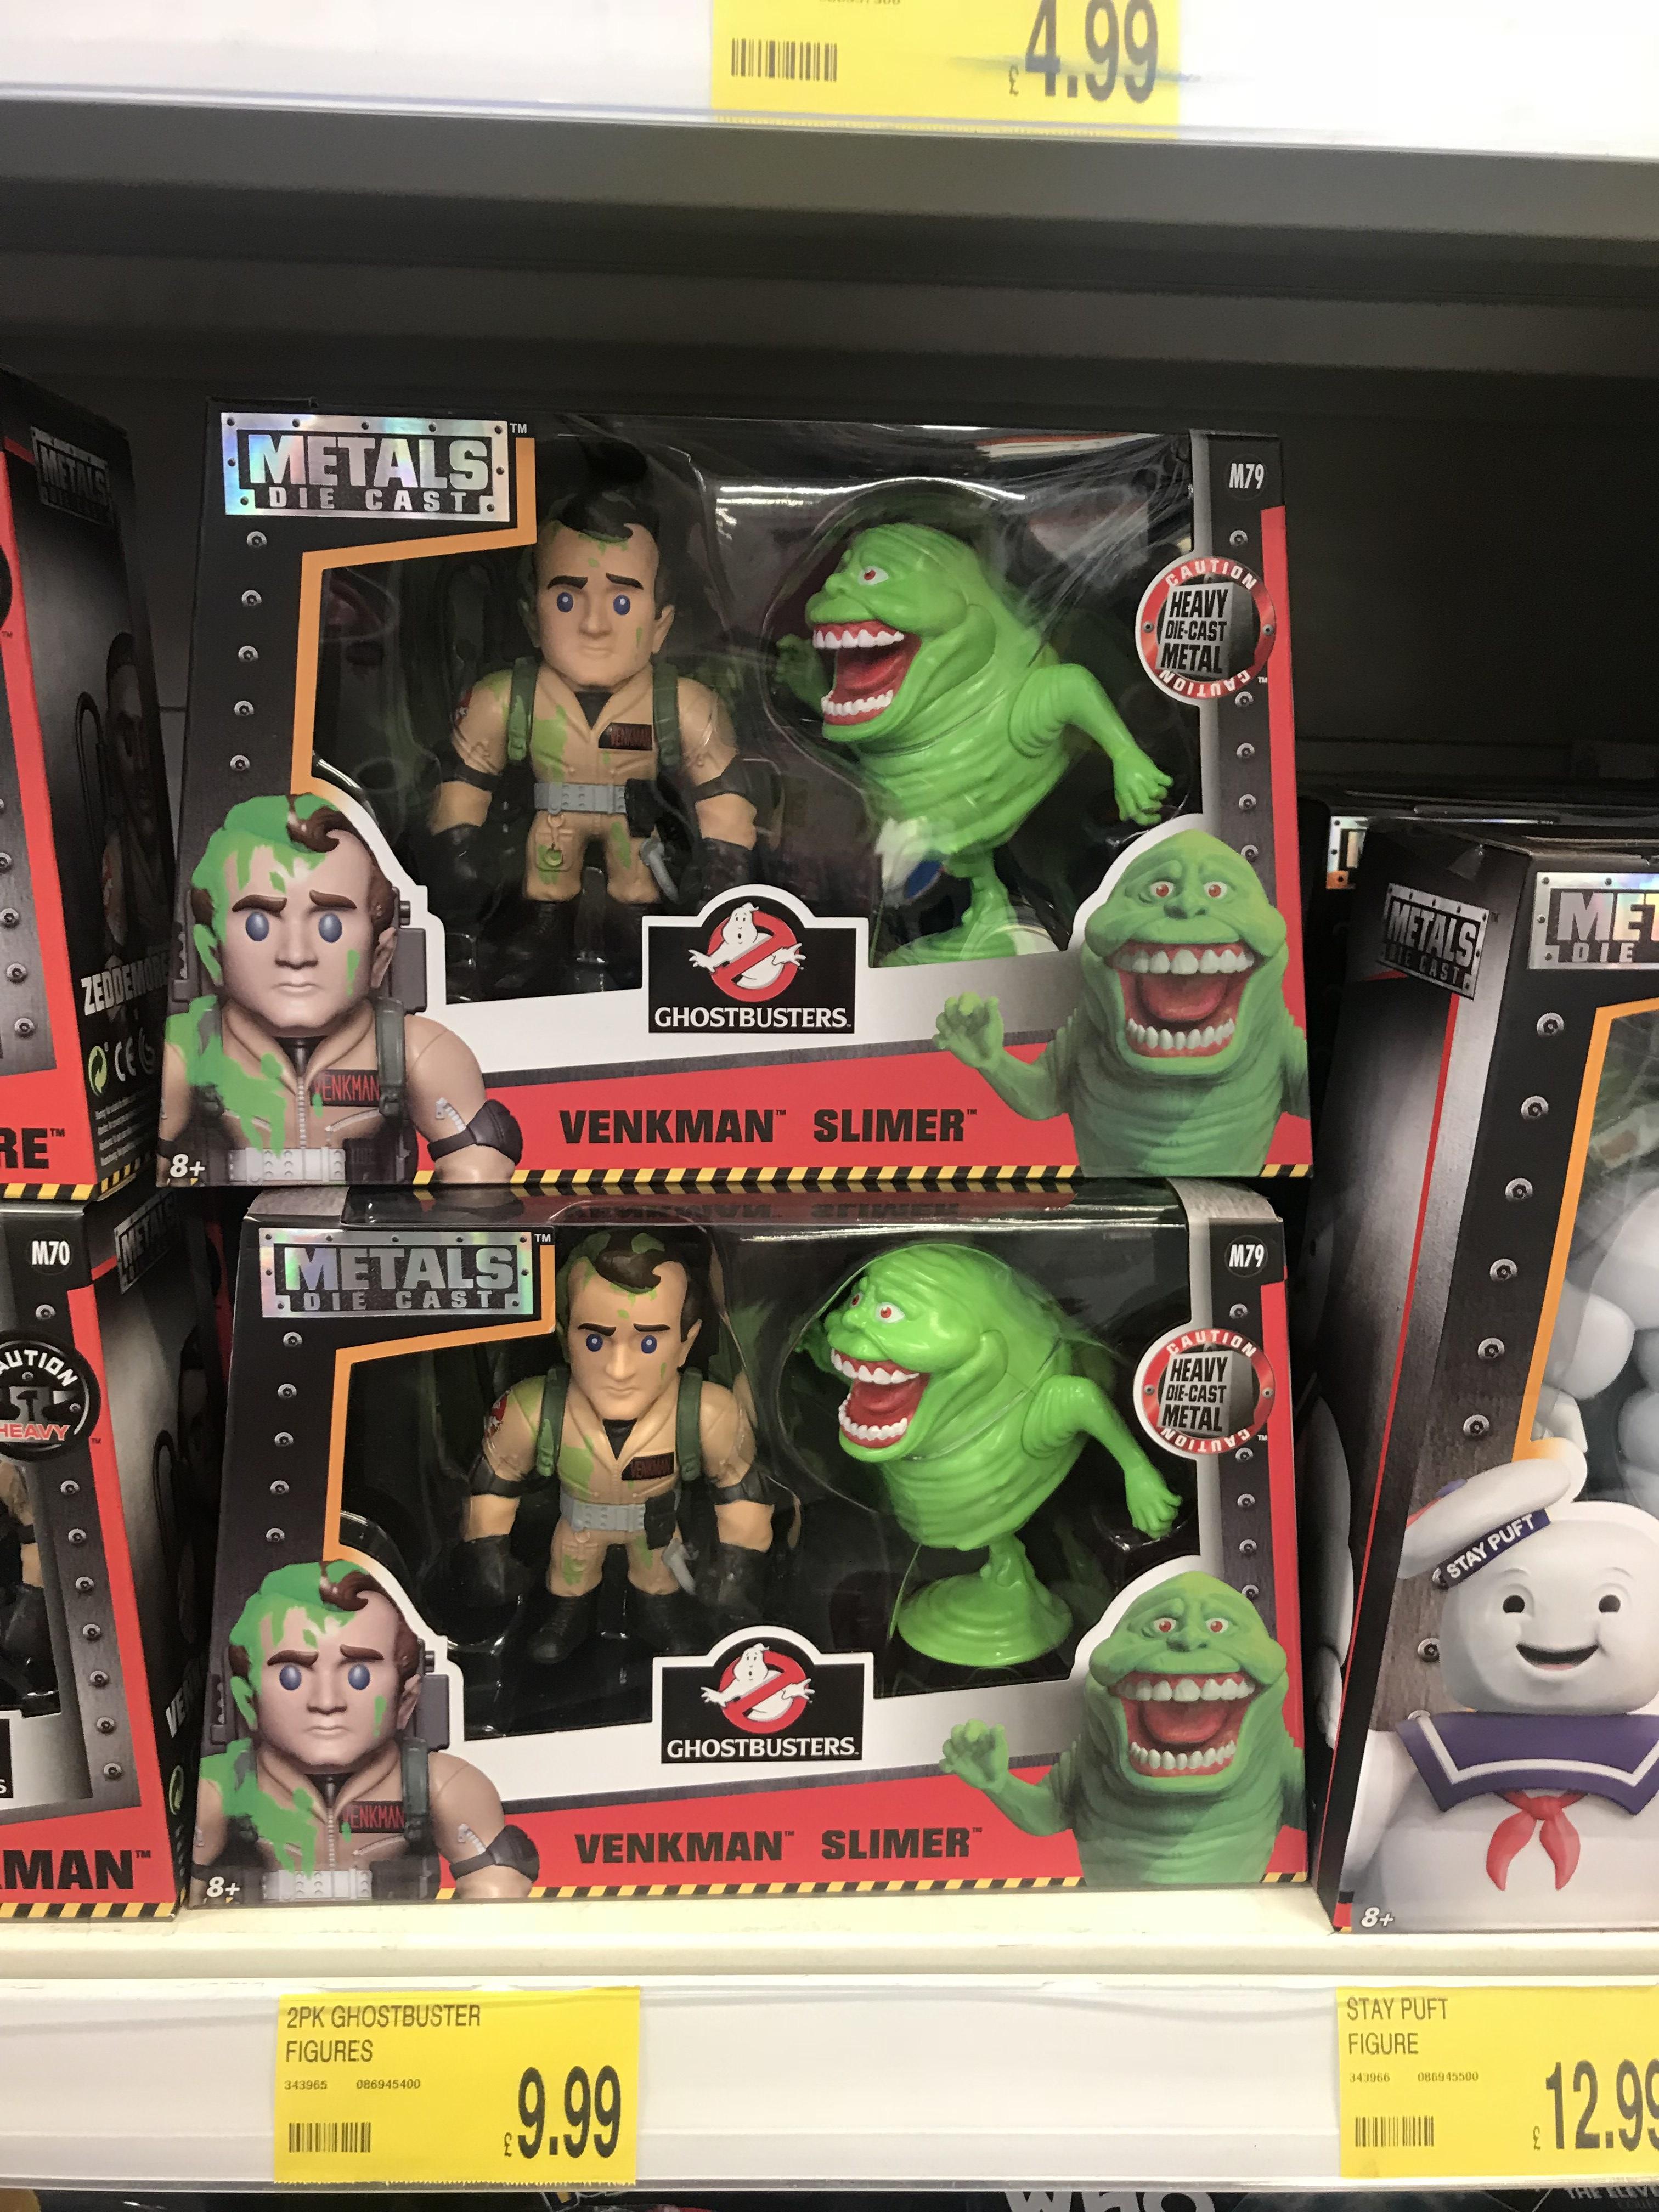 Ghostbusters (and Suicide Squad) Metal Die Cast Figures B&M Bargains Altrincham